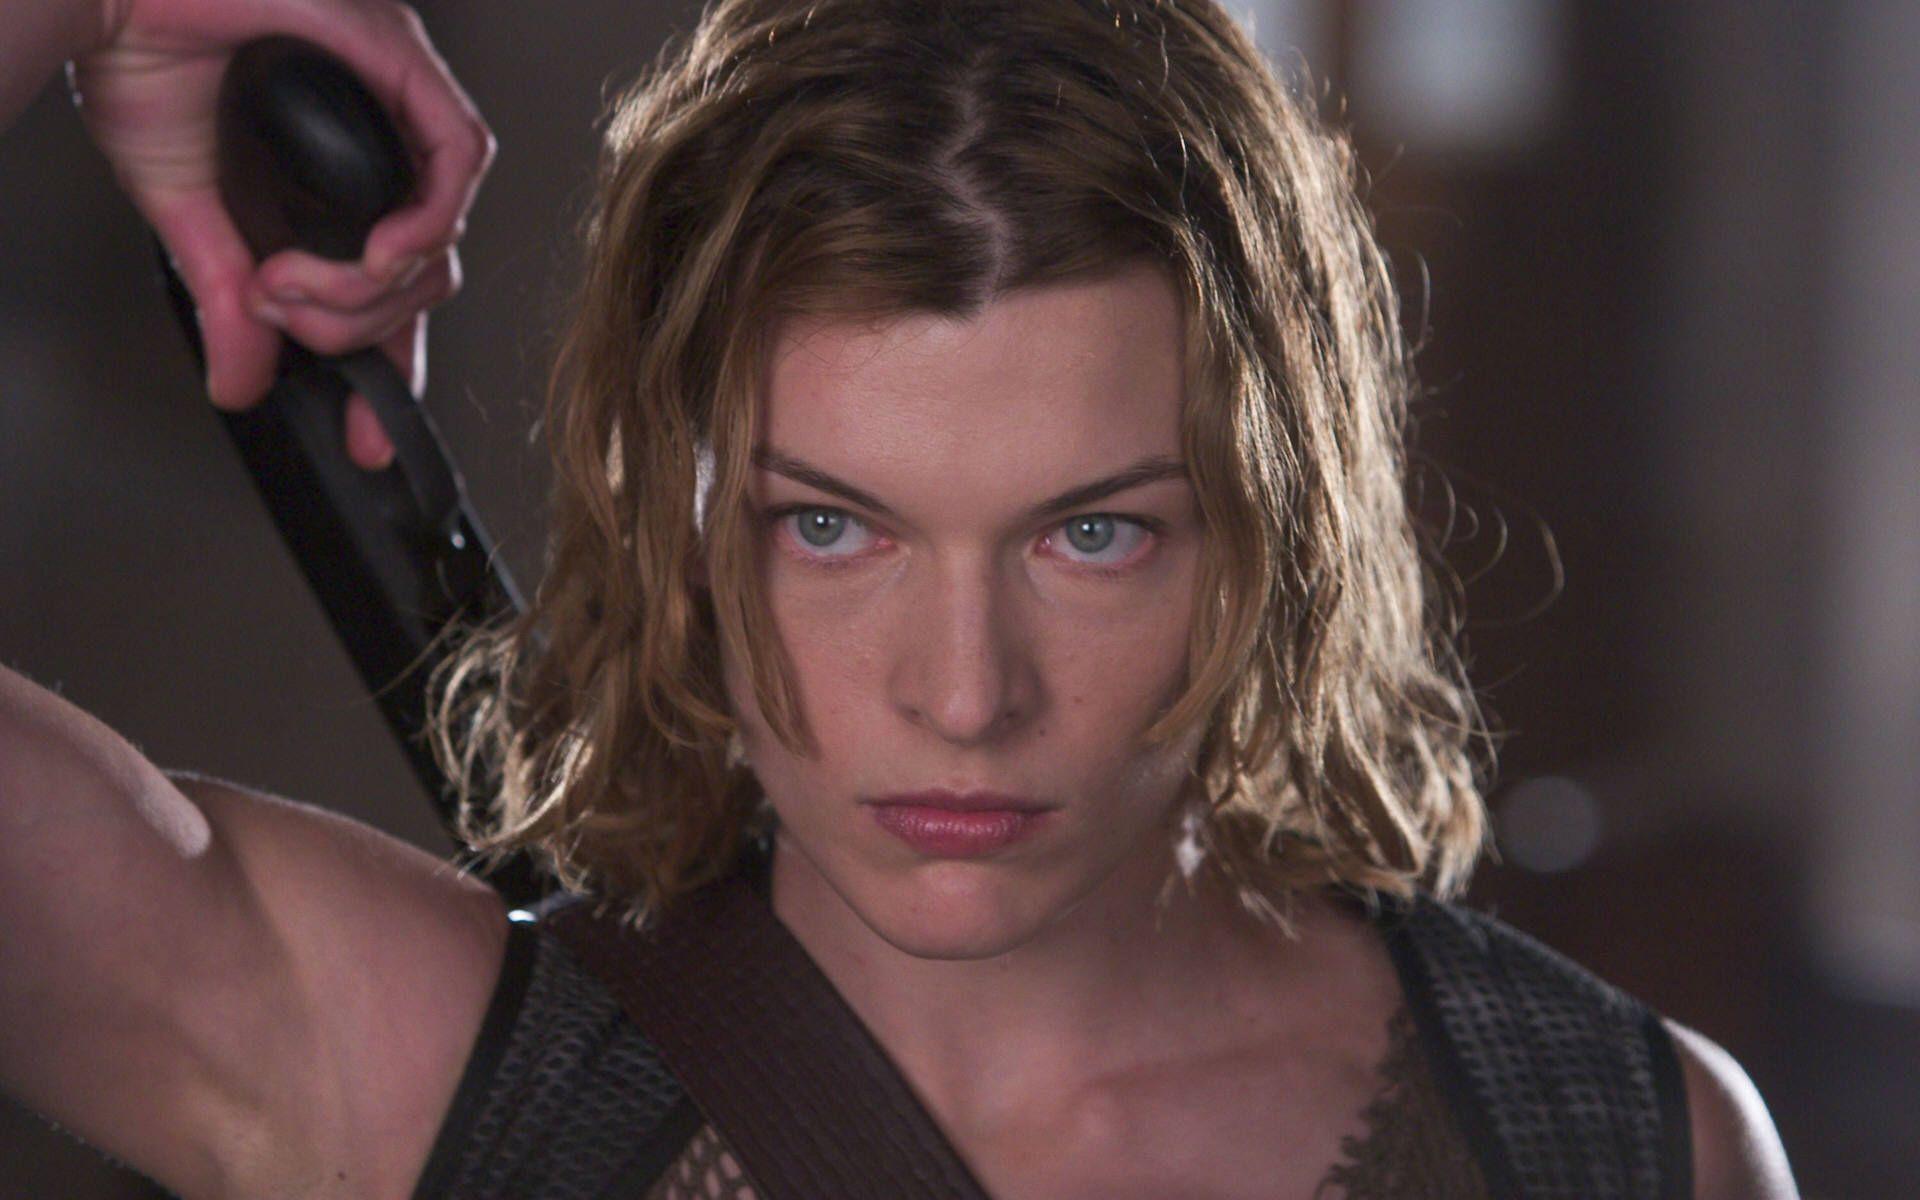 <b>Resident Evil Milla Jovovich Wallpapers</b> – <b>